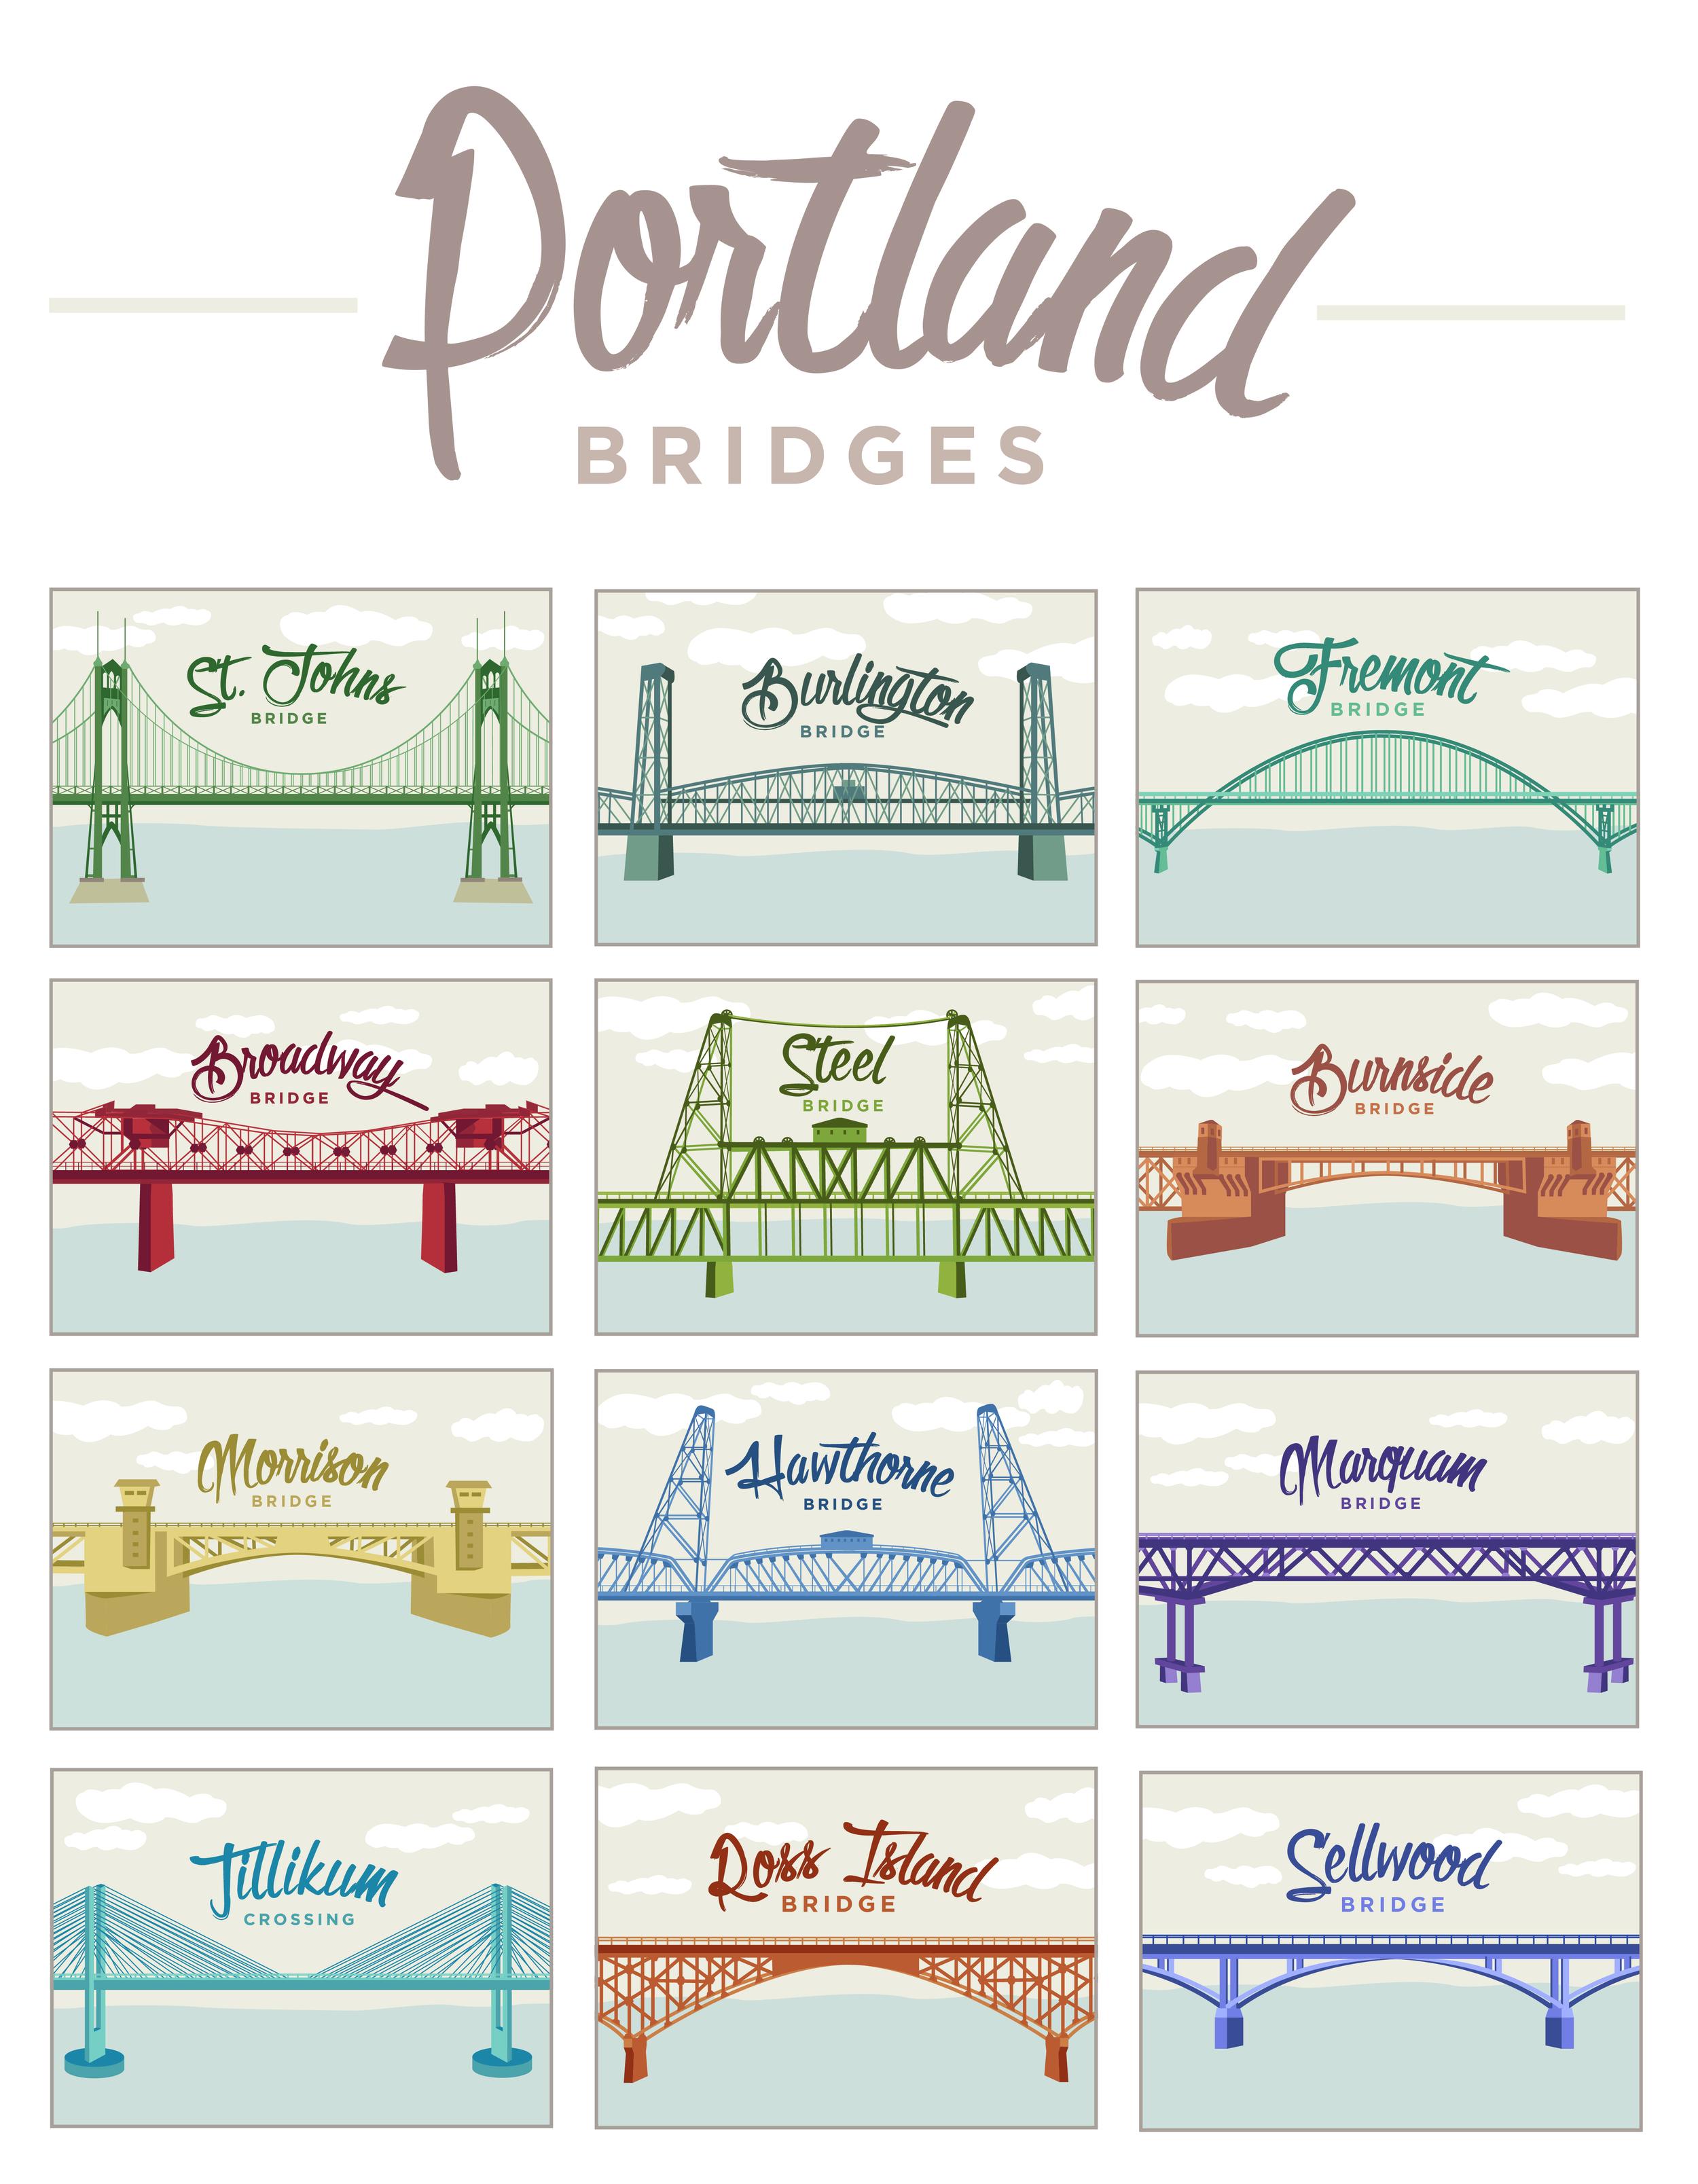 Bridge collage_website-01.jpg